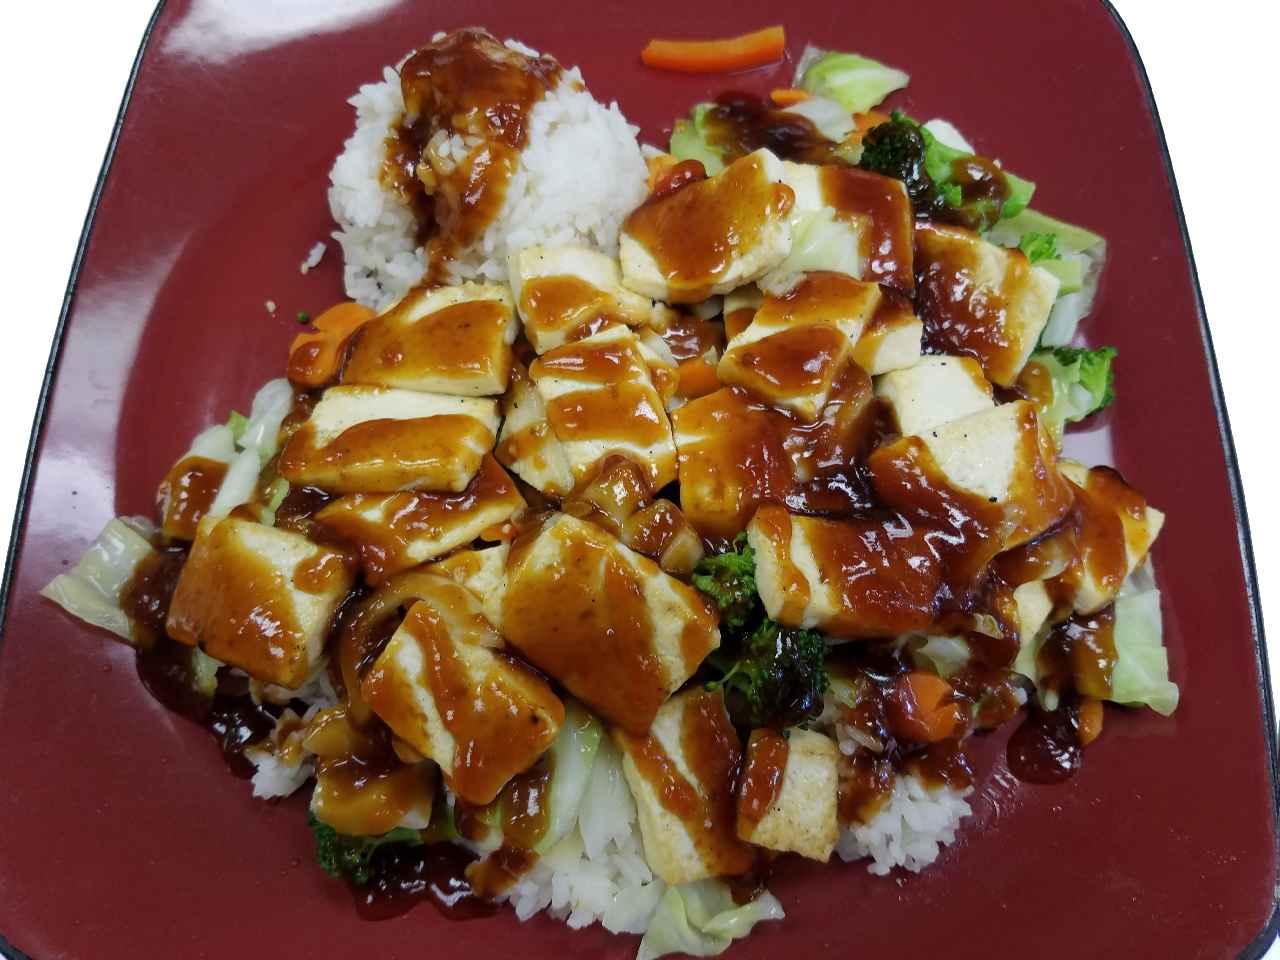 32. Tofu Teriyaki with Steamed Rice